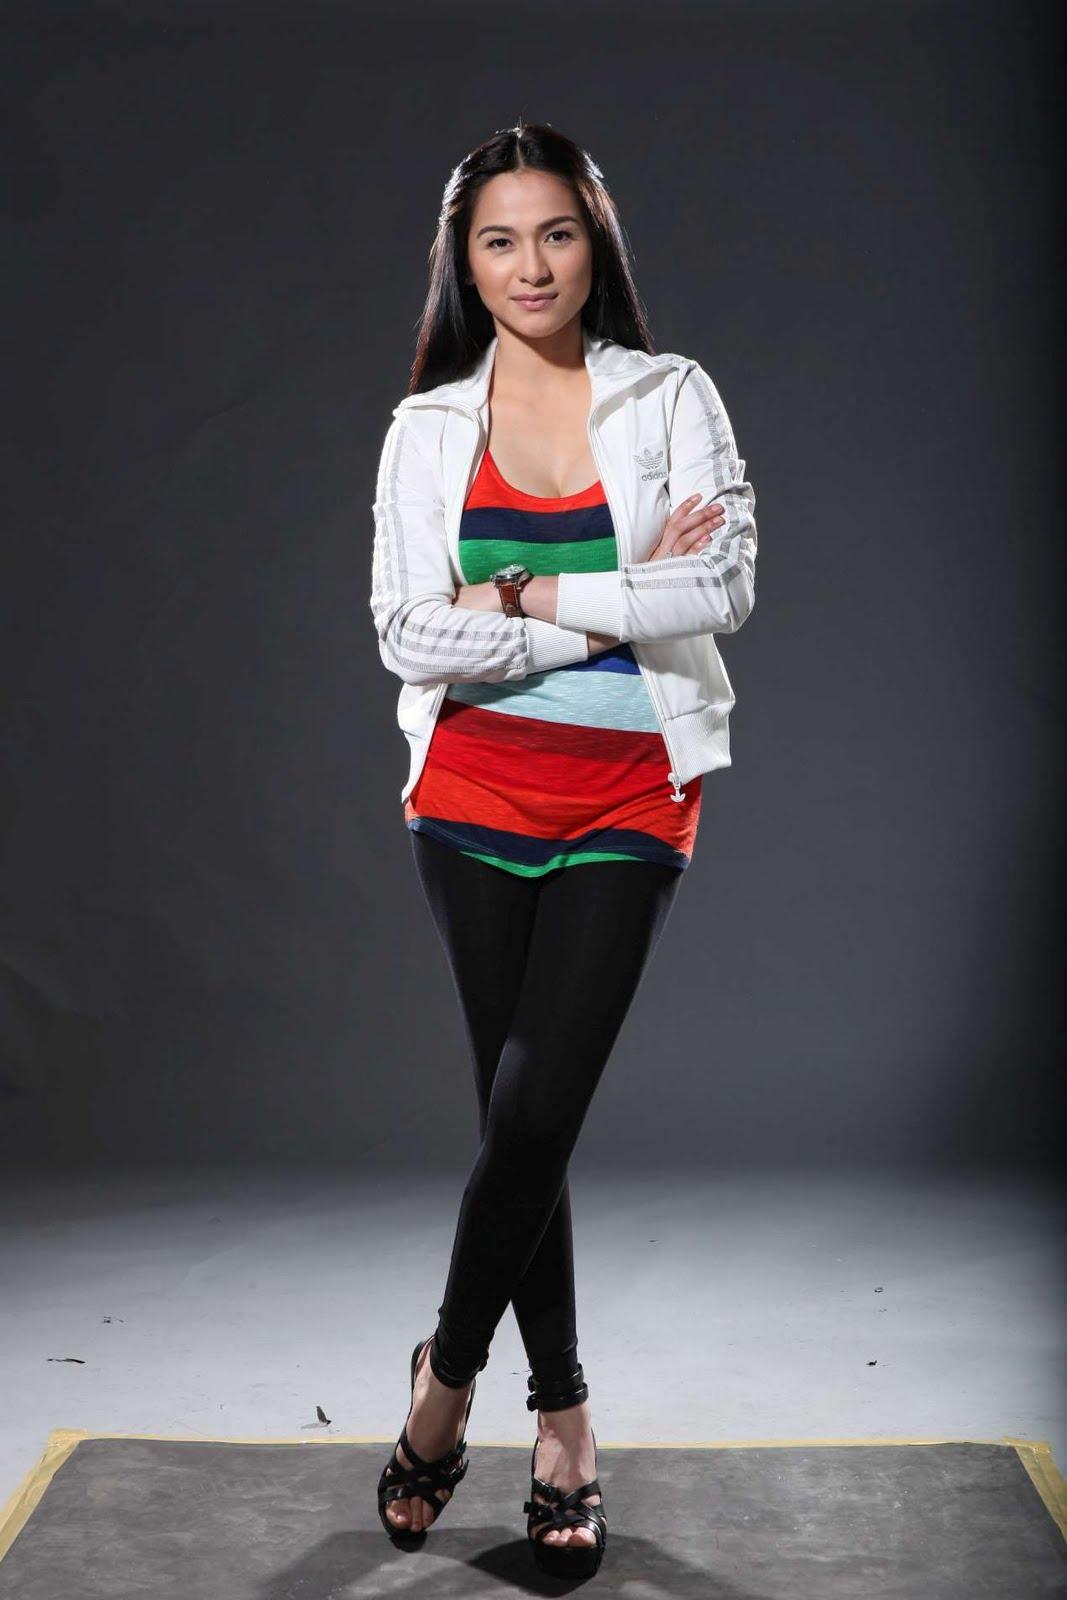 http://4.bp.blogspot.com/-DXOpSWtwY8g/ThPds92BEcI/AAAAAAAAD1Y/eLvi8LtZH_4/s1600/FB+Jennylyn+Mercado+006-K100.jpg